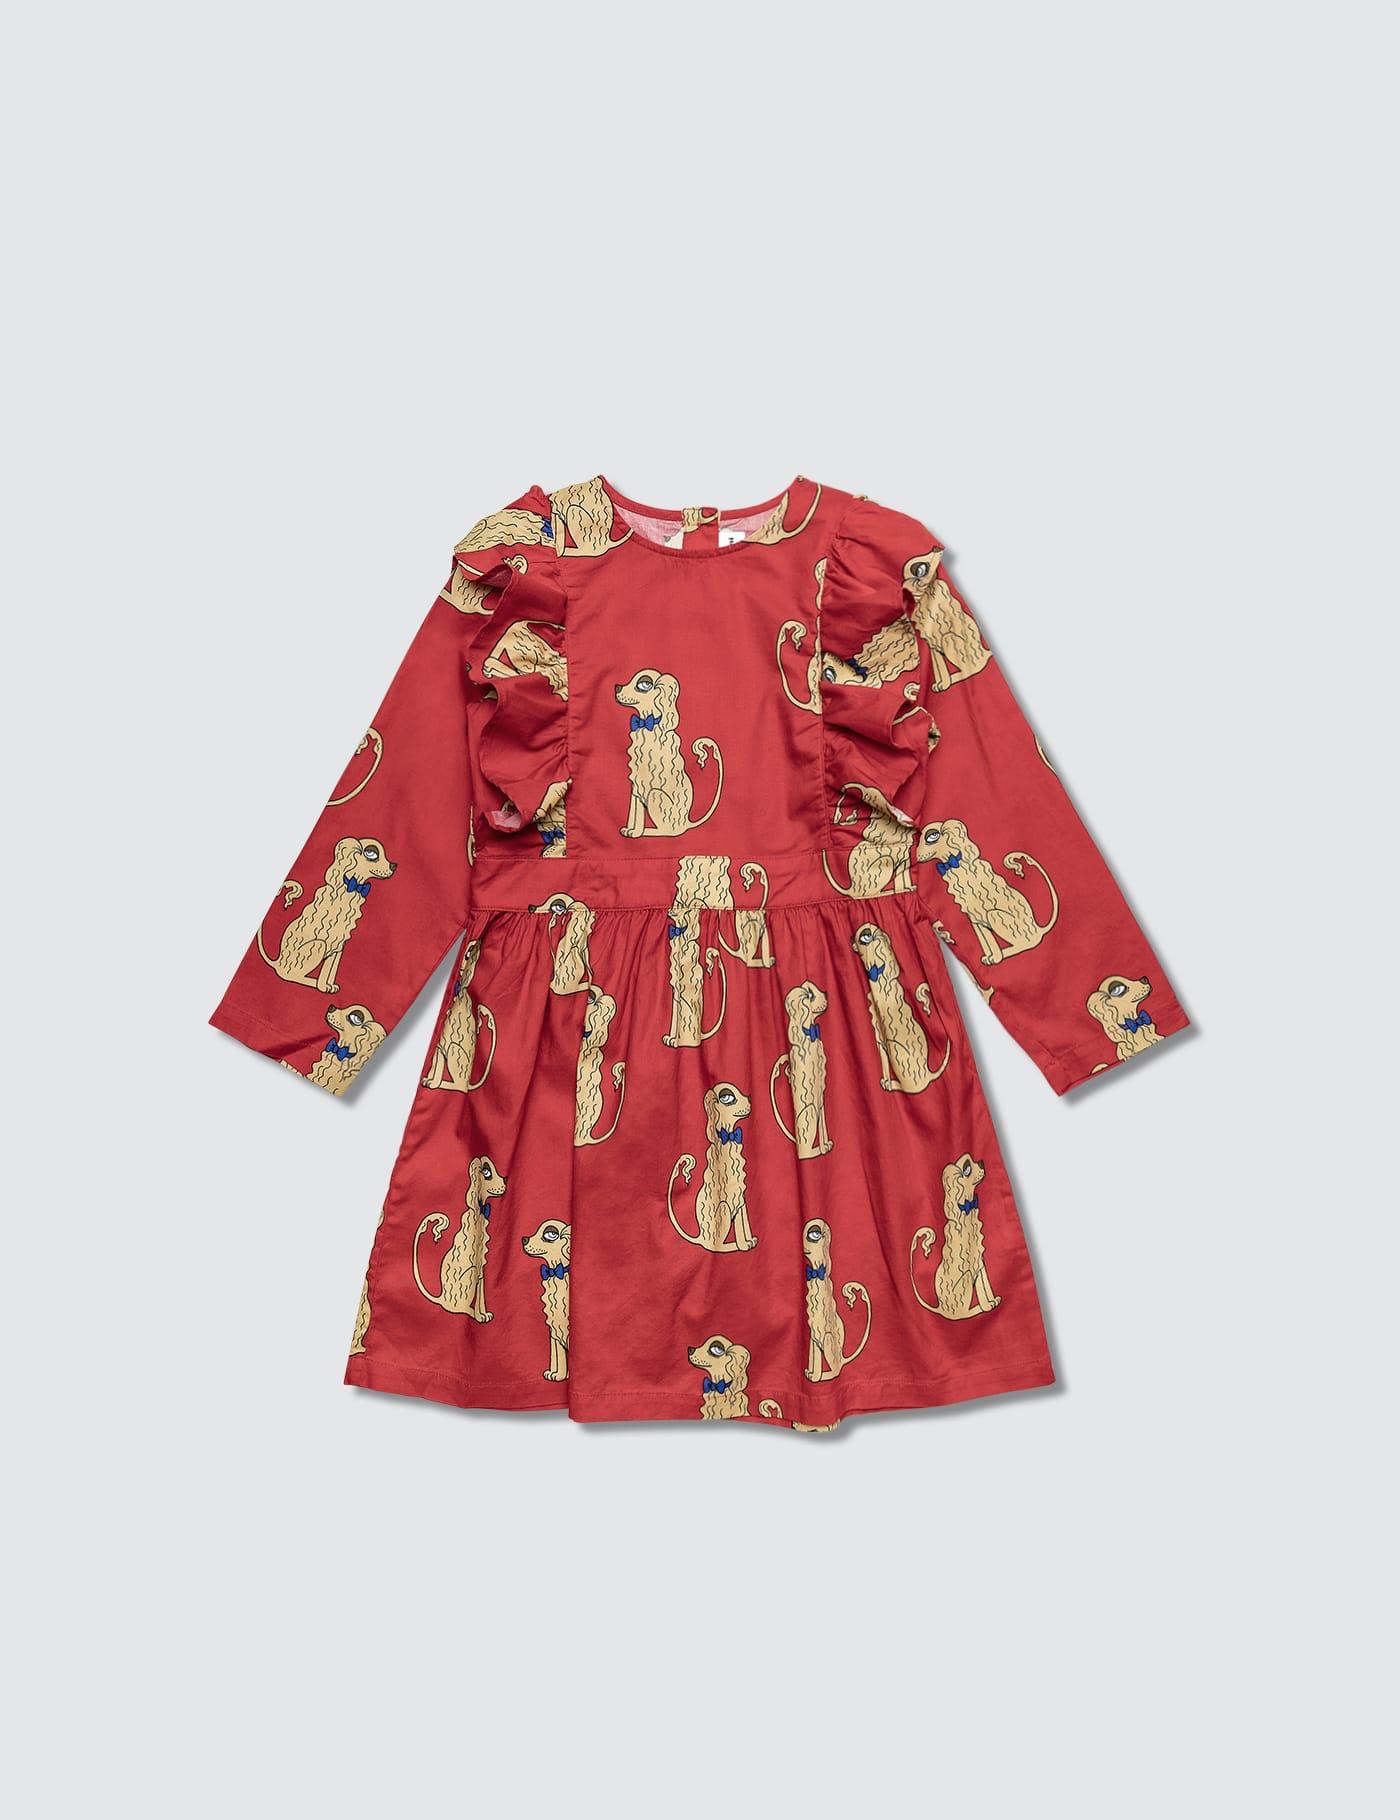 Spaniels Woven Ruffled Dress